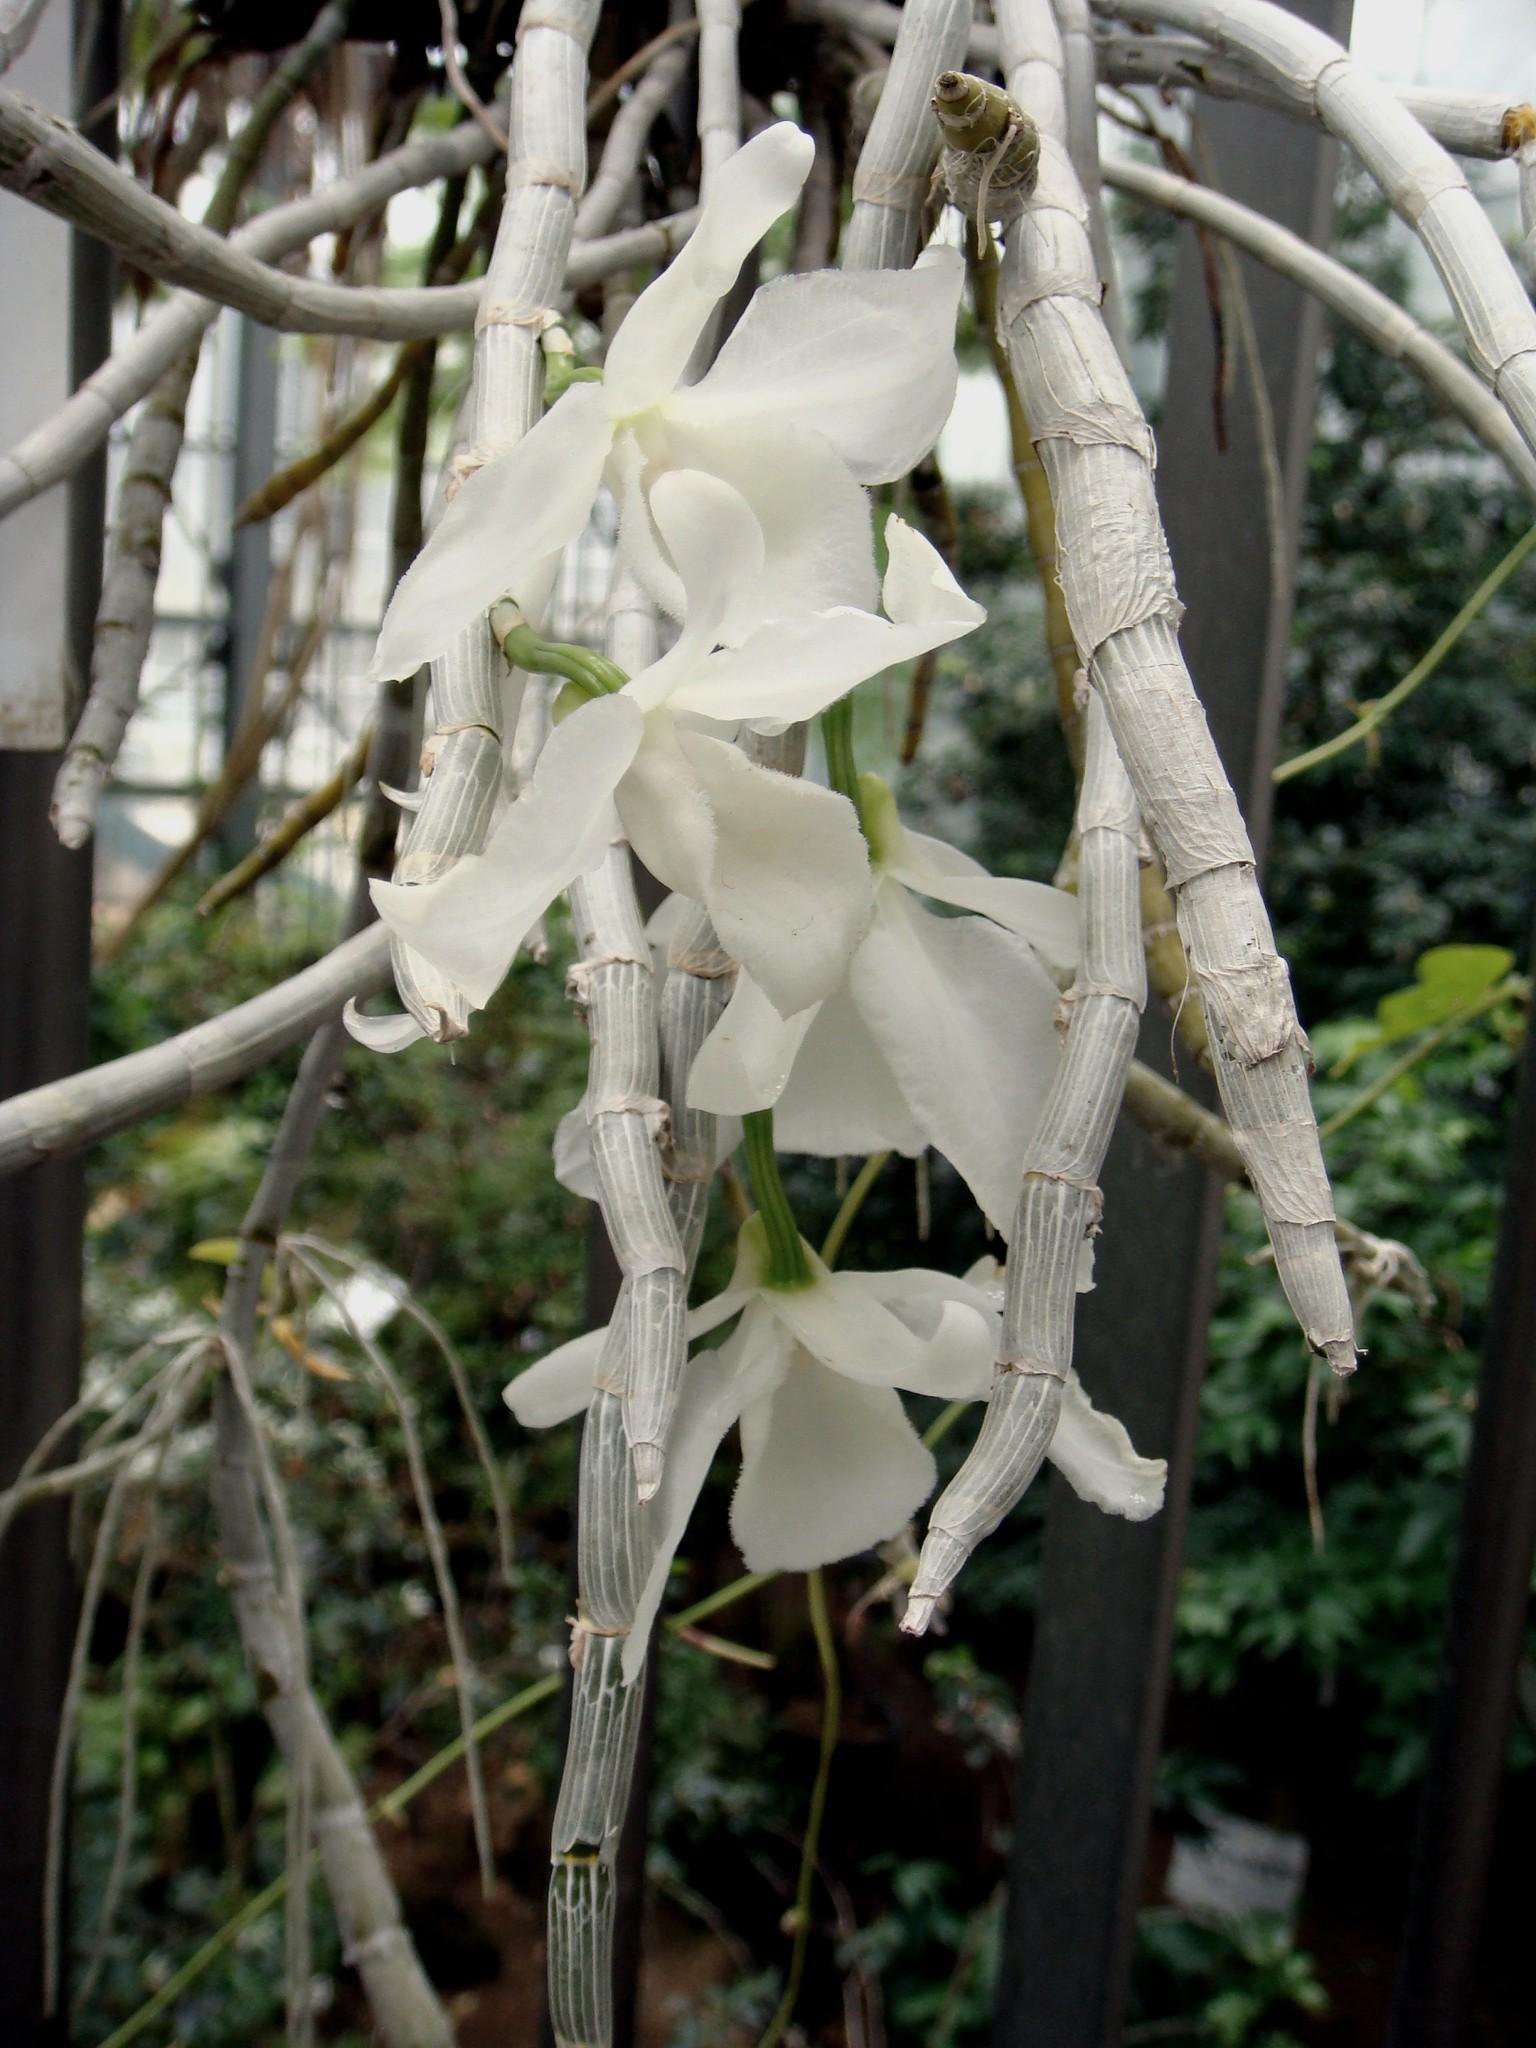 http://orchids.la.coocan.jp/Dendrobium/Dendrobium%20anosmum%20alba/DSC06760.JPG